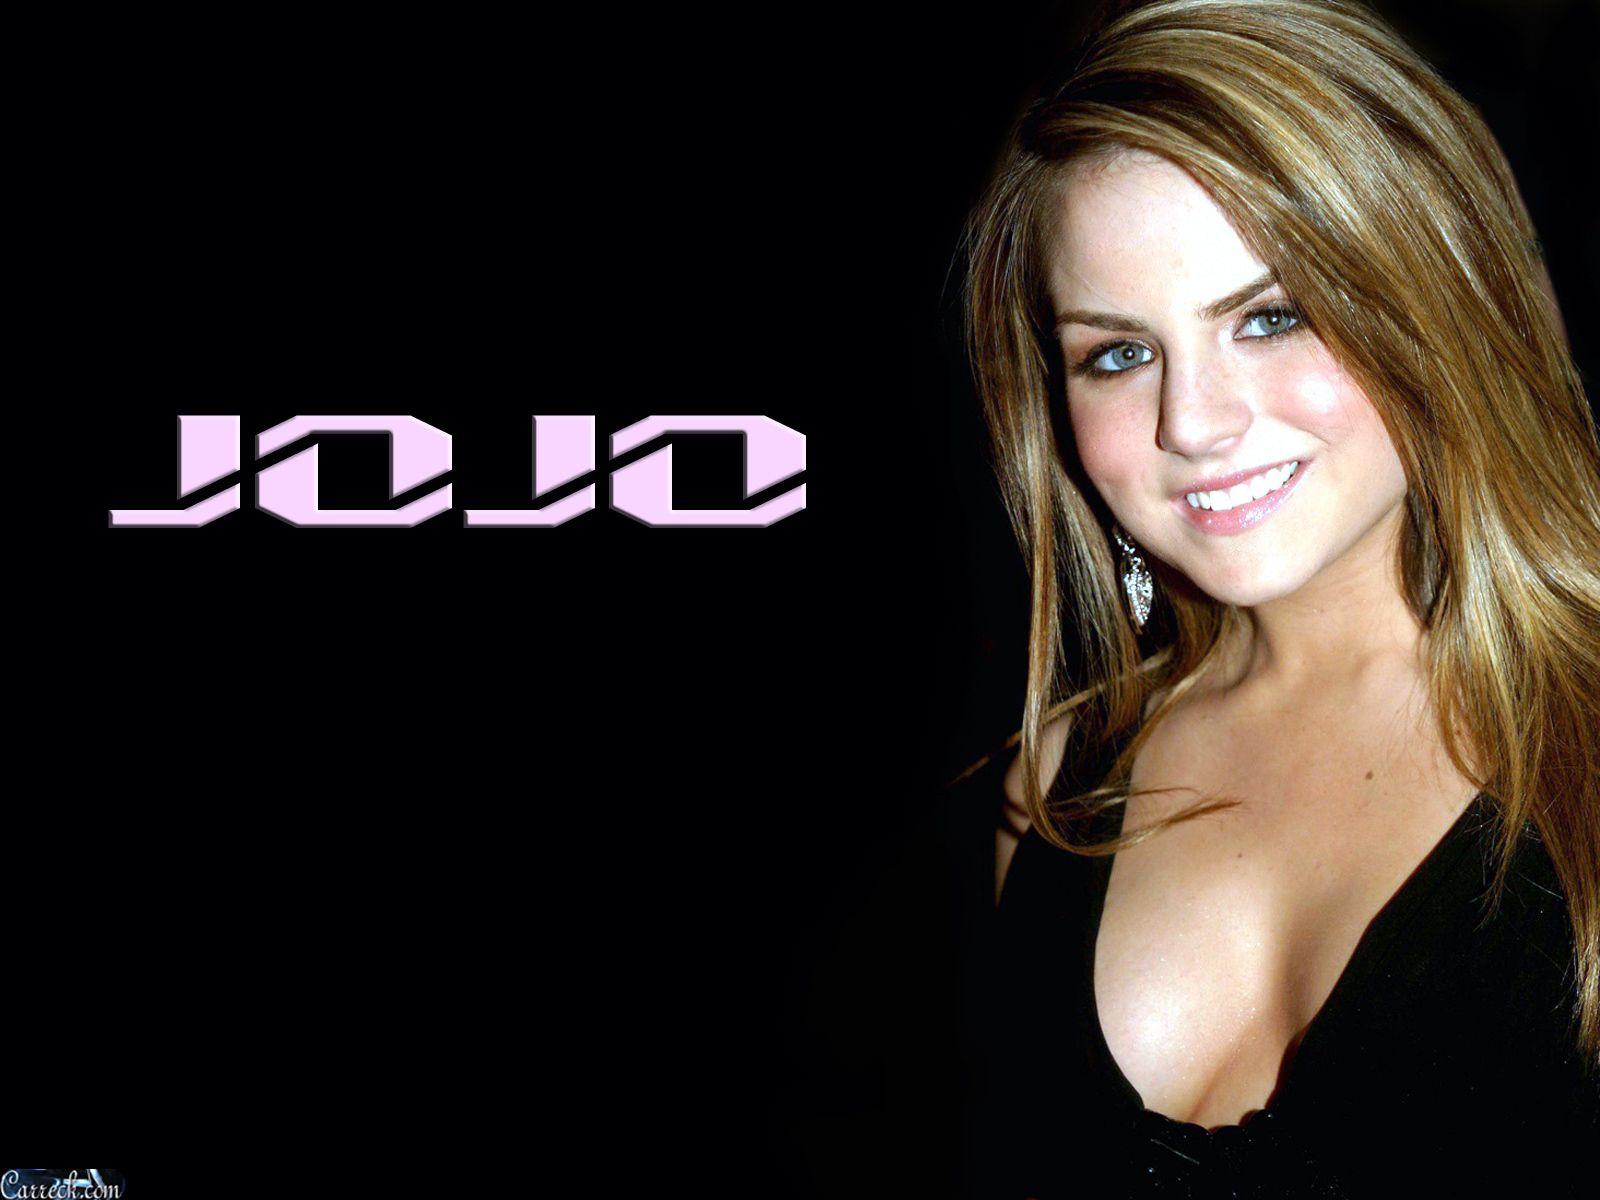 Olivia thirlby cast in judge dredd